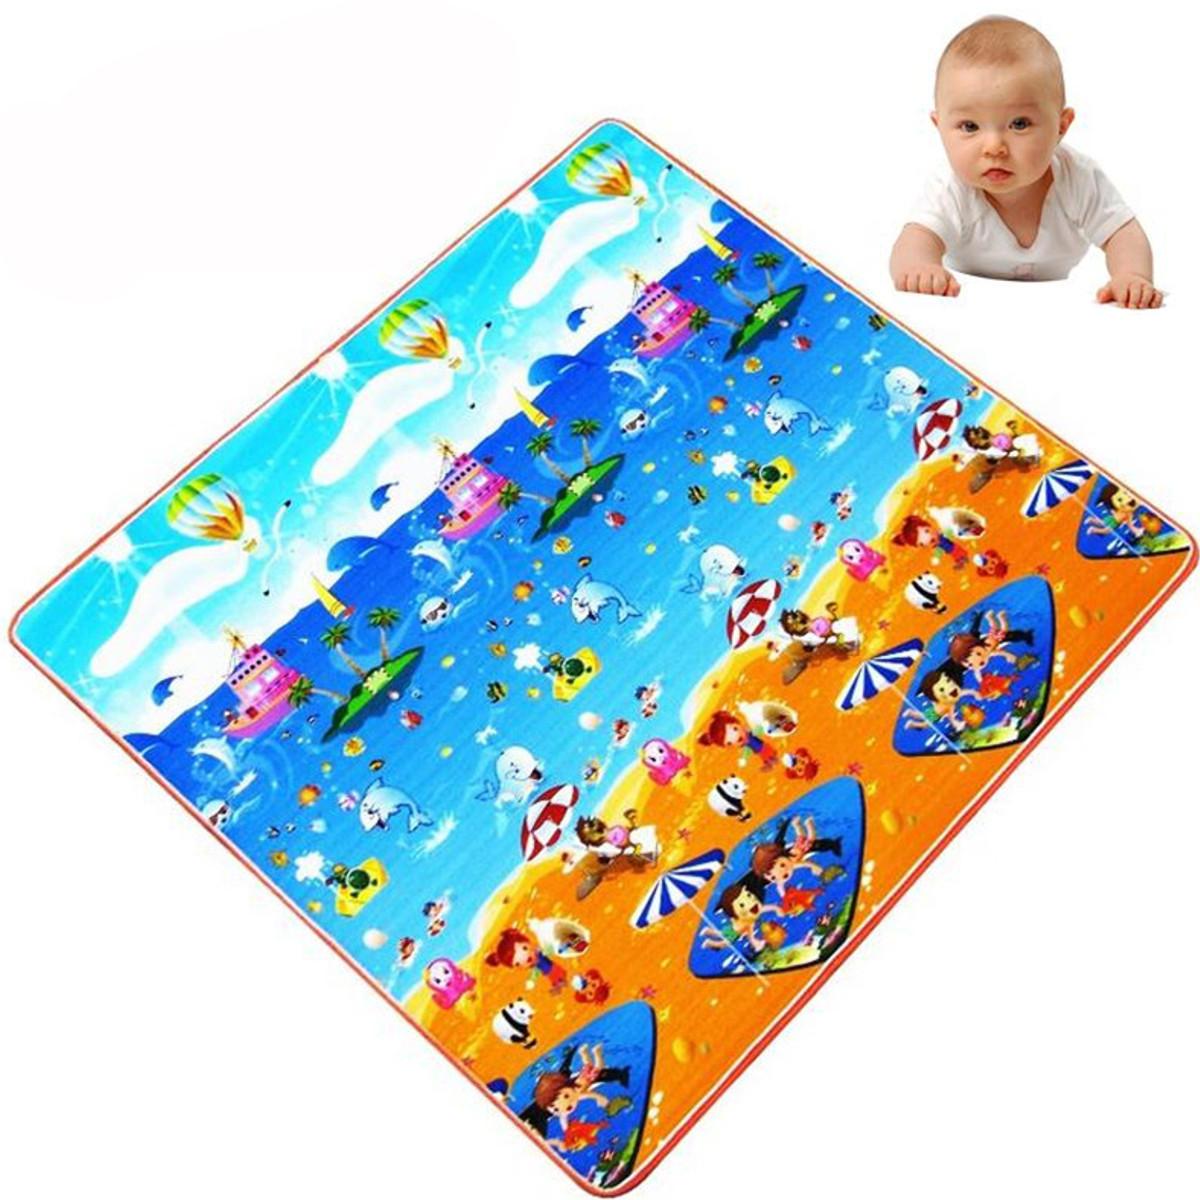 Soft Toy Baby Kids Play Mat Child Activity Foam Floor Gym Crawl Creeping Blanket